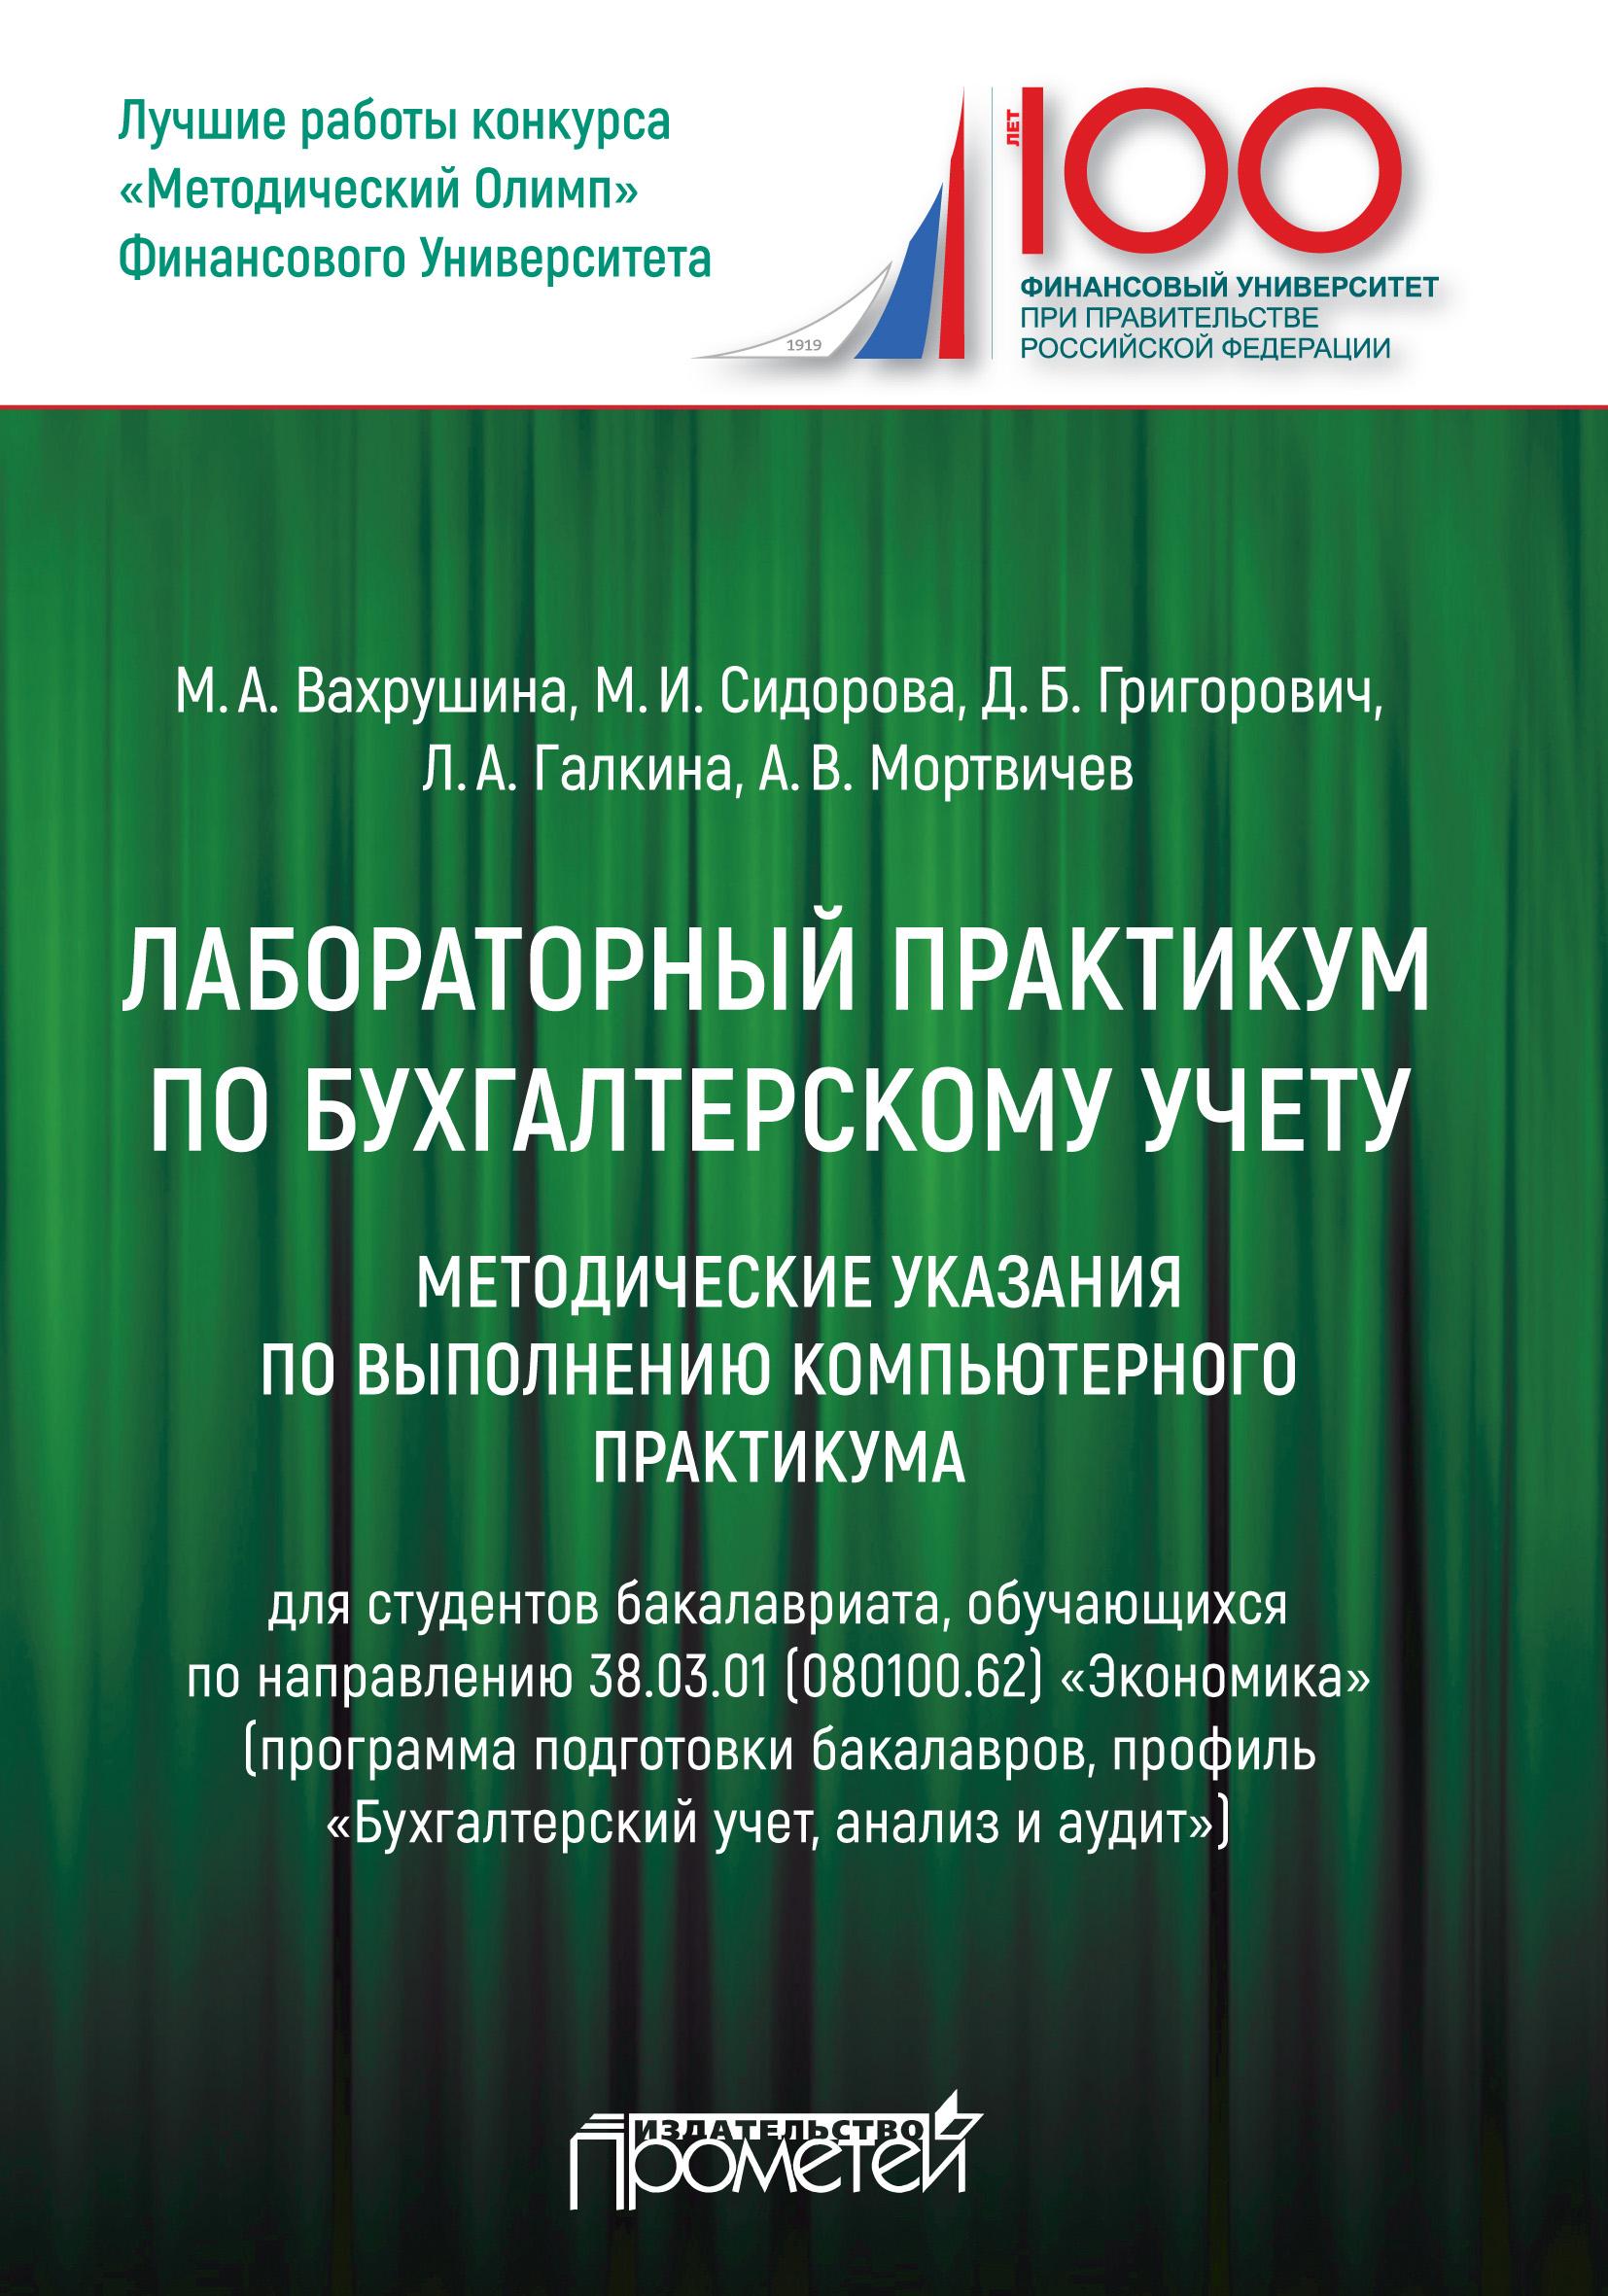 М. А. Вахрушина Лабораторный практикум по бухгалтерскому учету цены онлайн